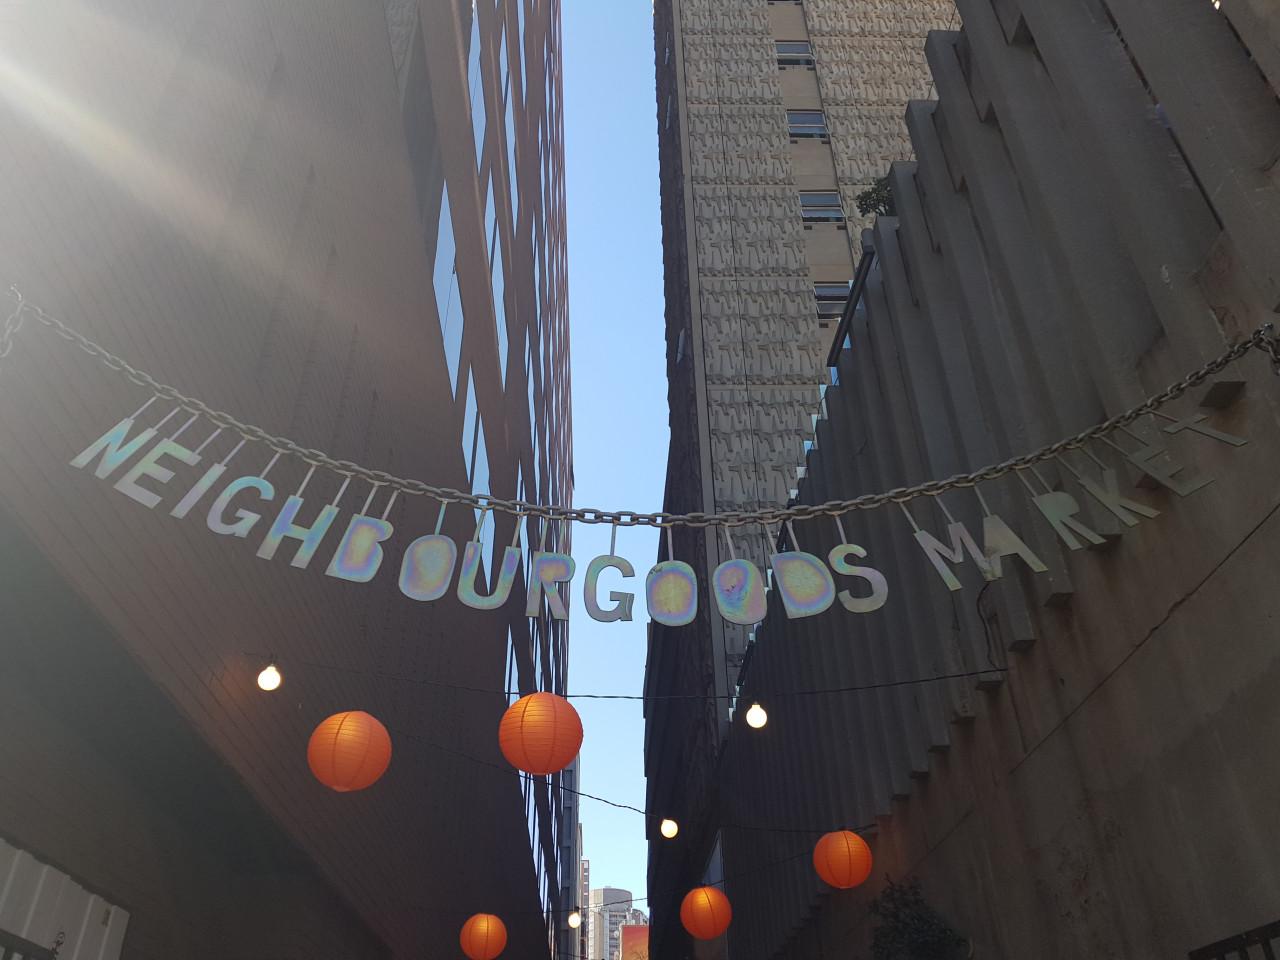 Le marché branché de Neighbourgoods le samedi. (© Chloé OBARA))